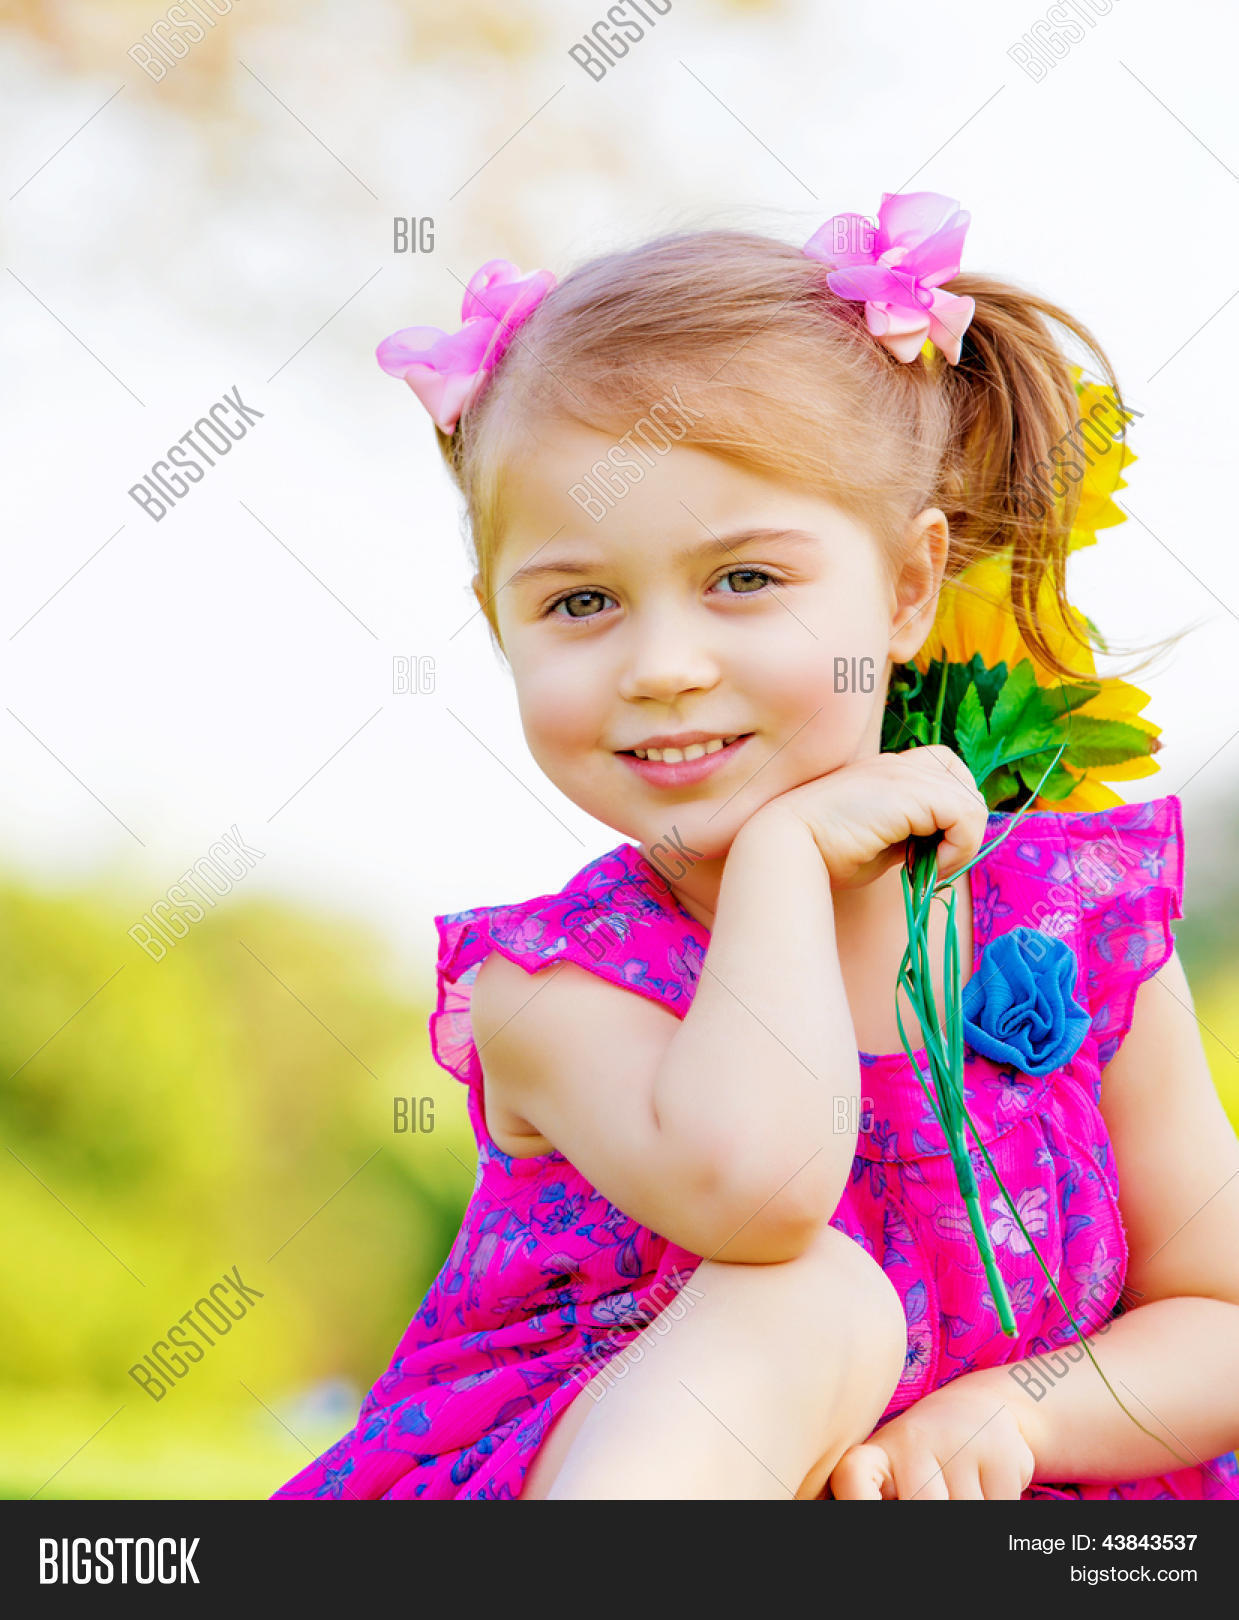 Happy Baby Girl Playing Outdoor, Image & Photo | Bigstock